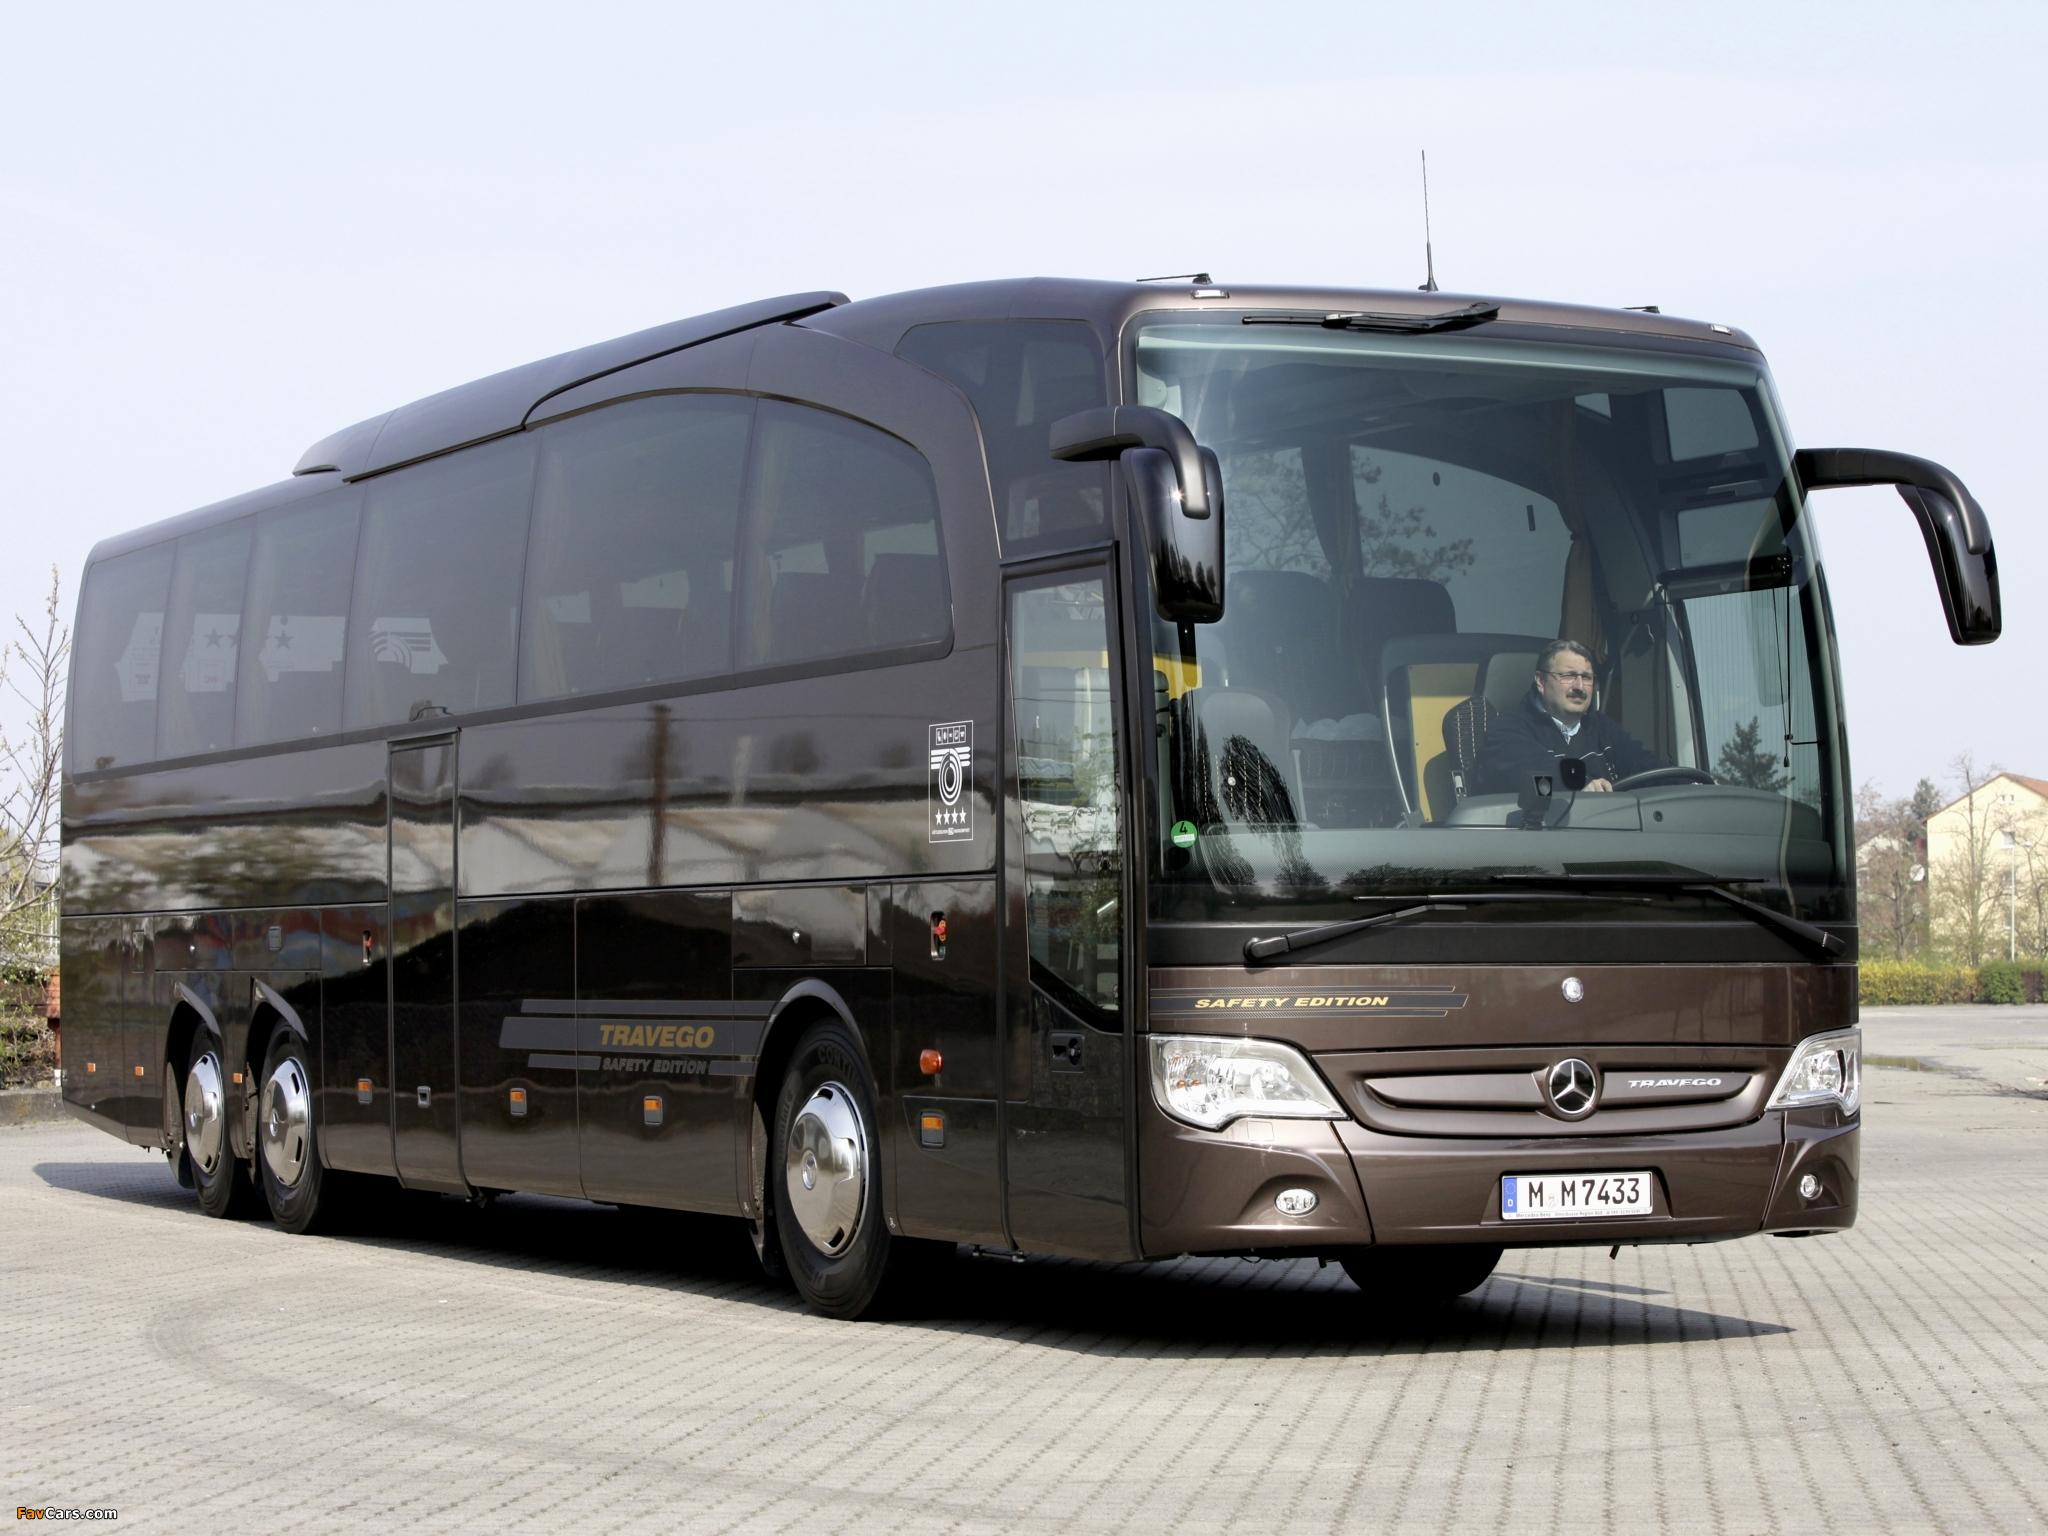 Mercedes Travego Vs Turismo